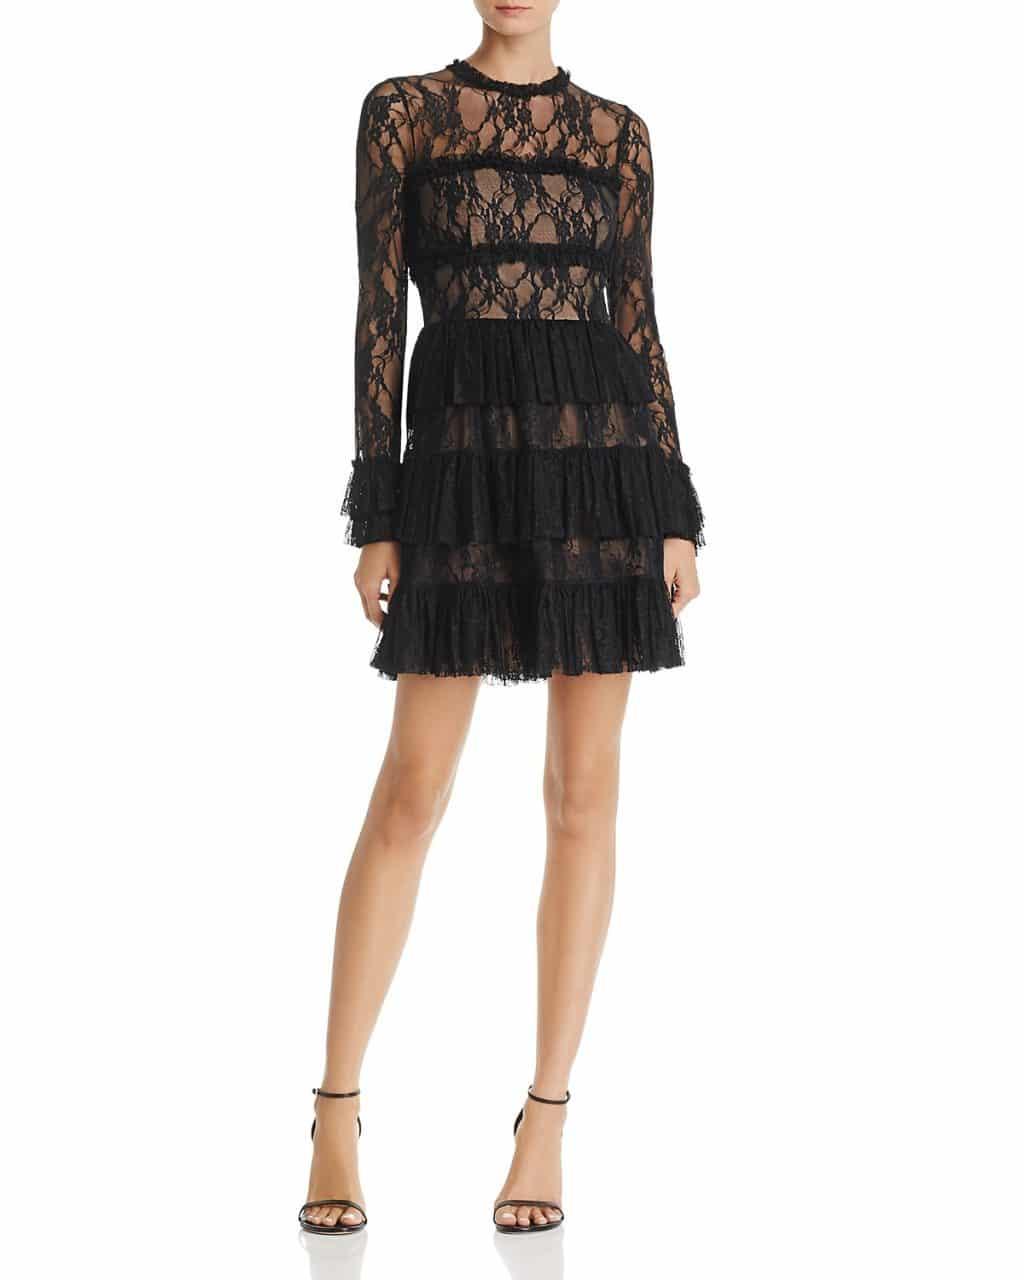 BAILEY 44 Feeding Circle Ruffled Lace Black Dress